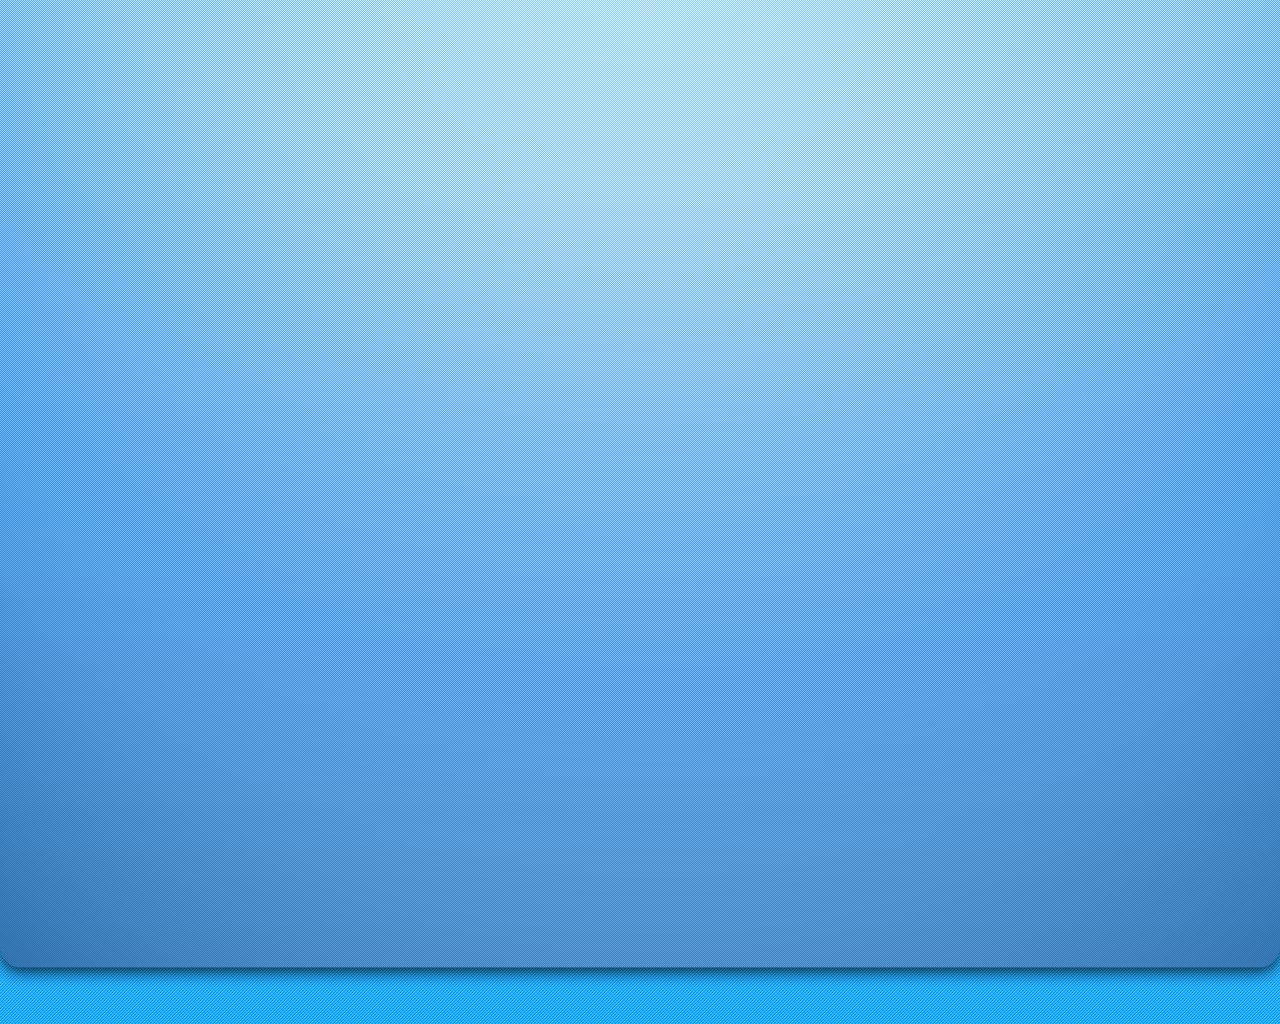 Wallpaper for Windows XP wallpaper blue background 1280x1024